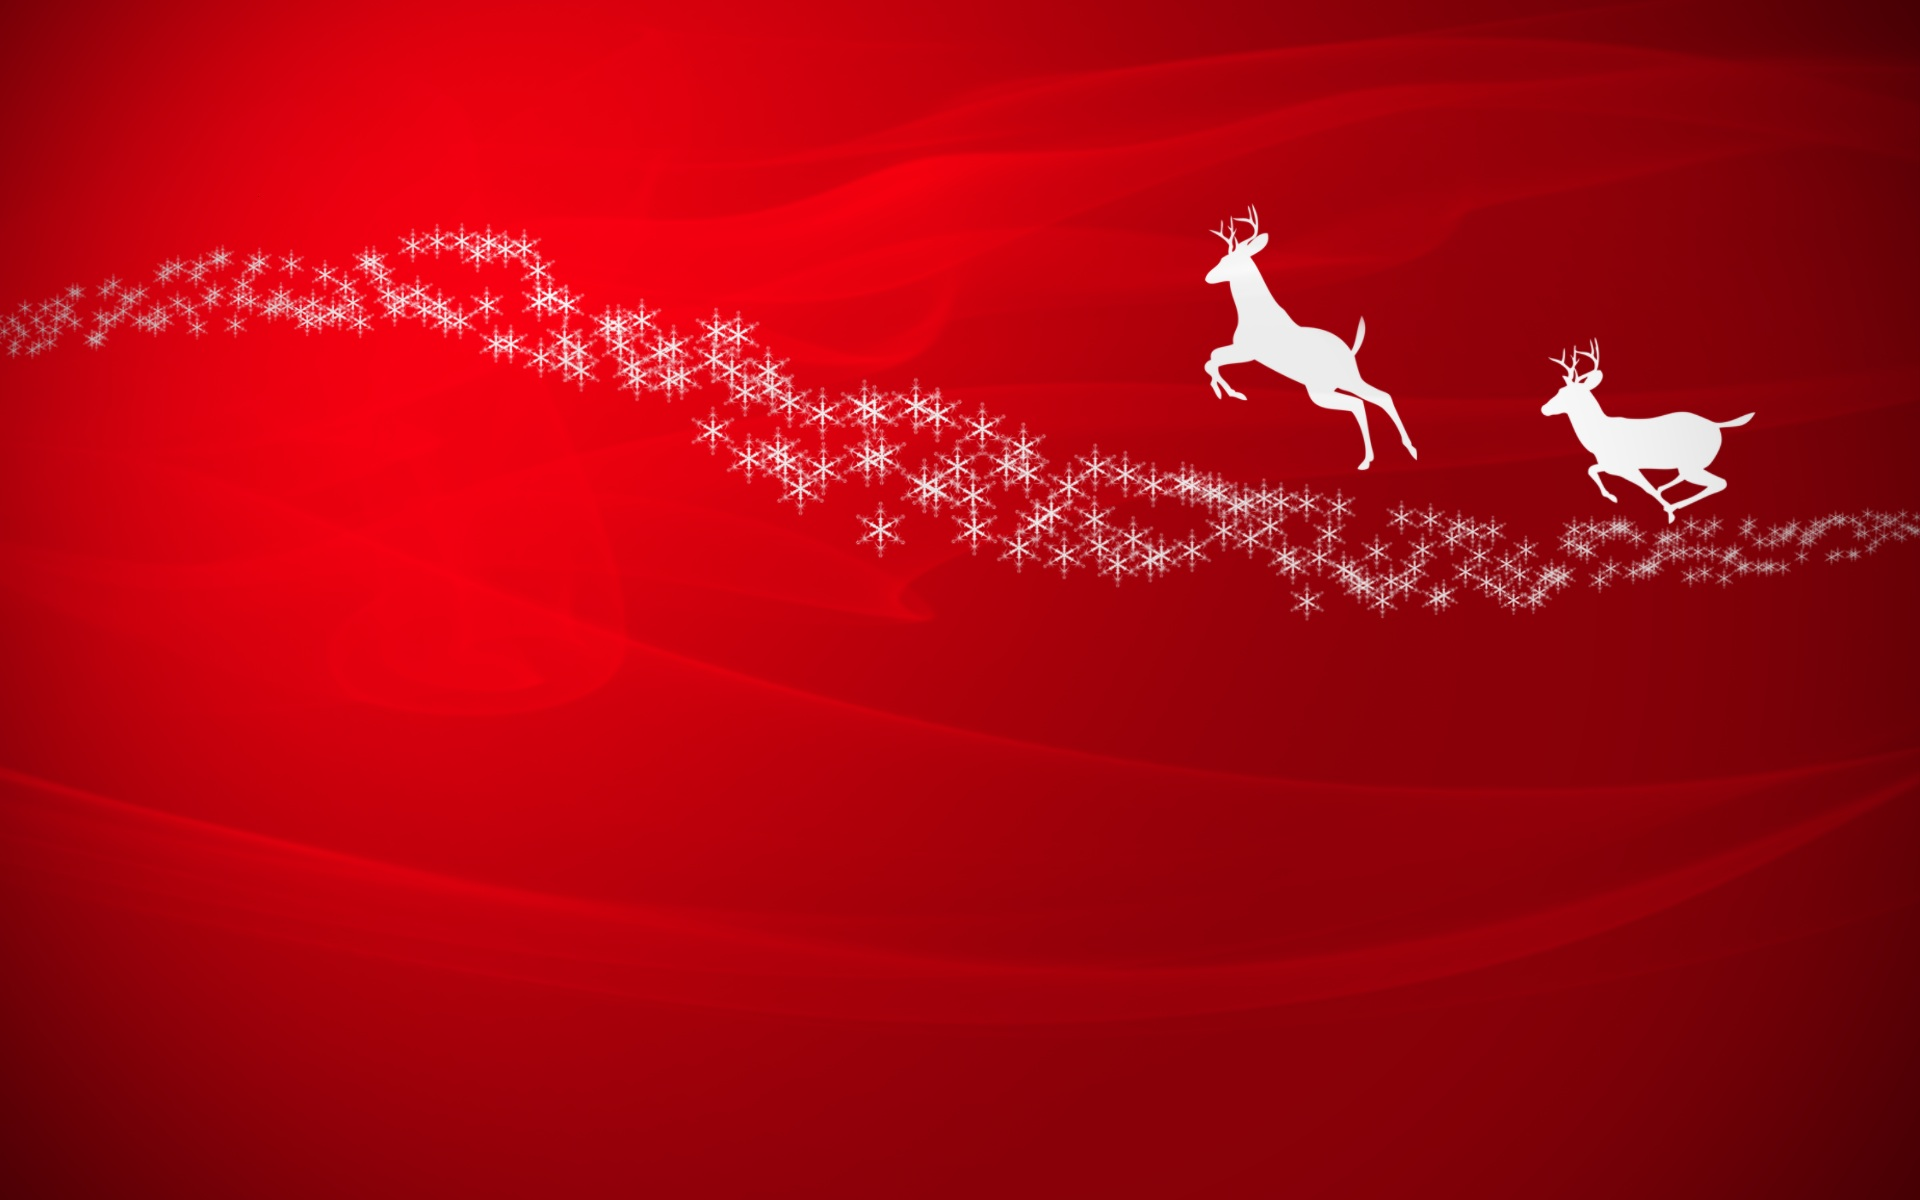 Windows 7 Christmas Theme wallpaper   26575 1920x1200